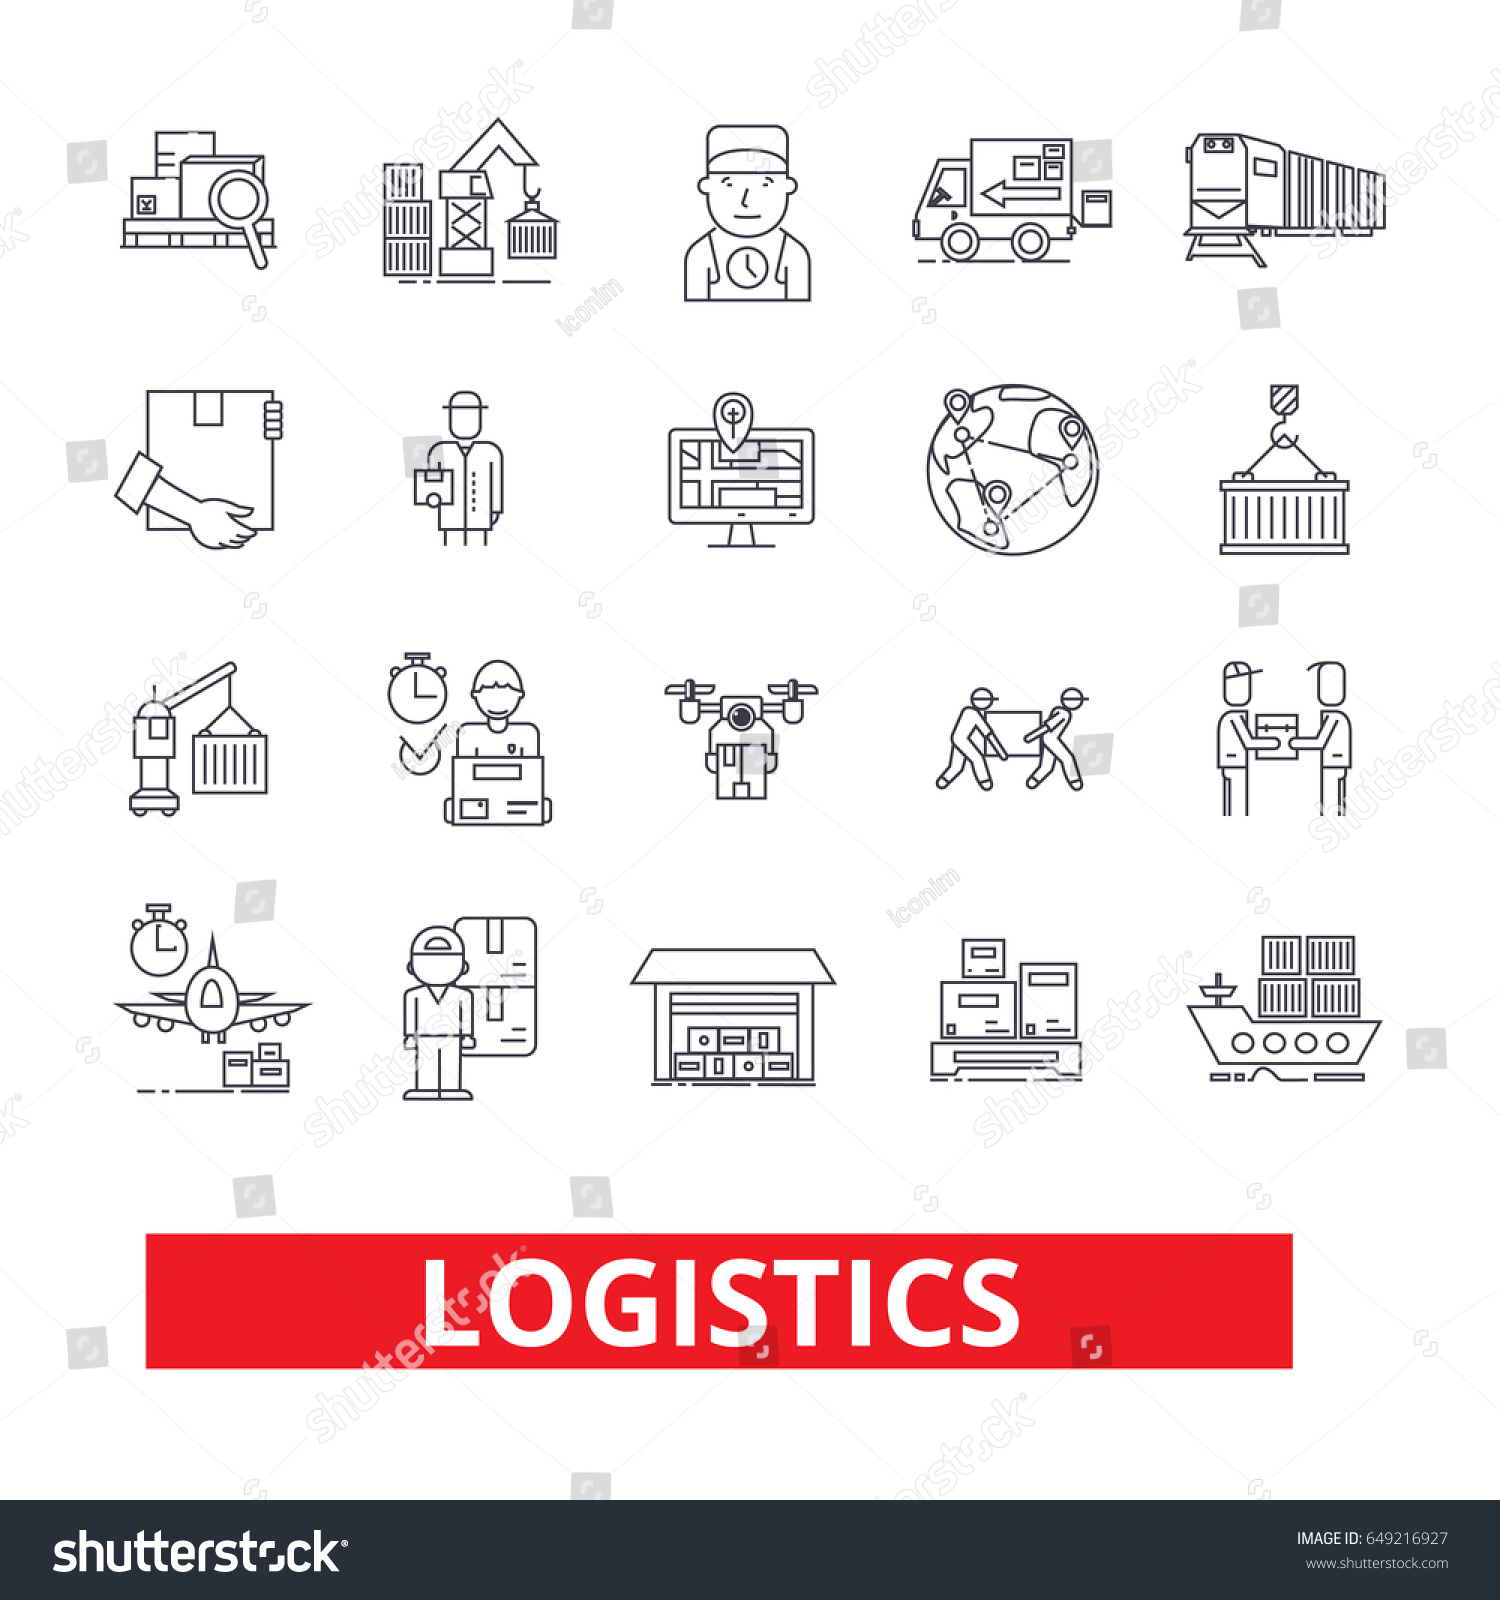 Logistics Calendar Design : Logistics transportation warehouse supply chain truck